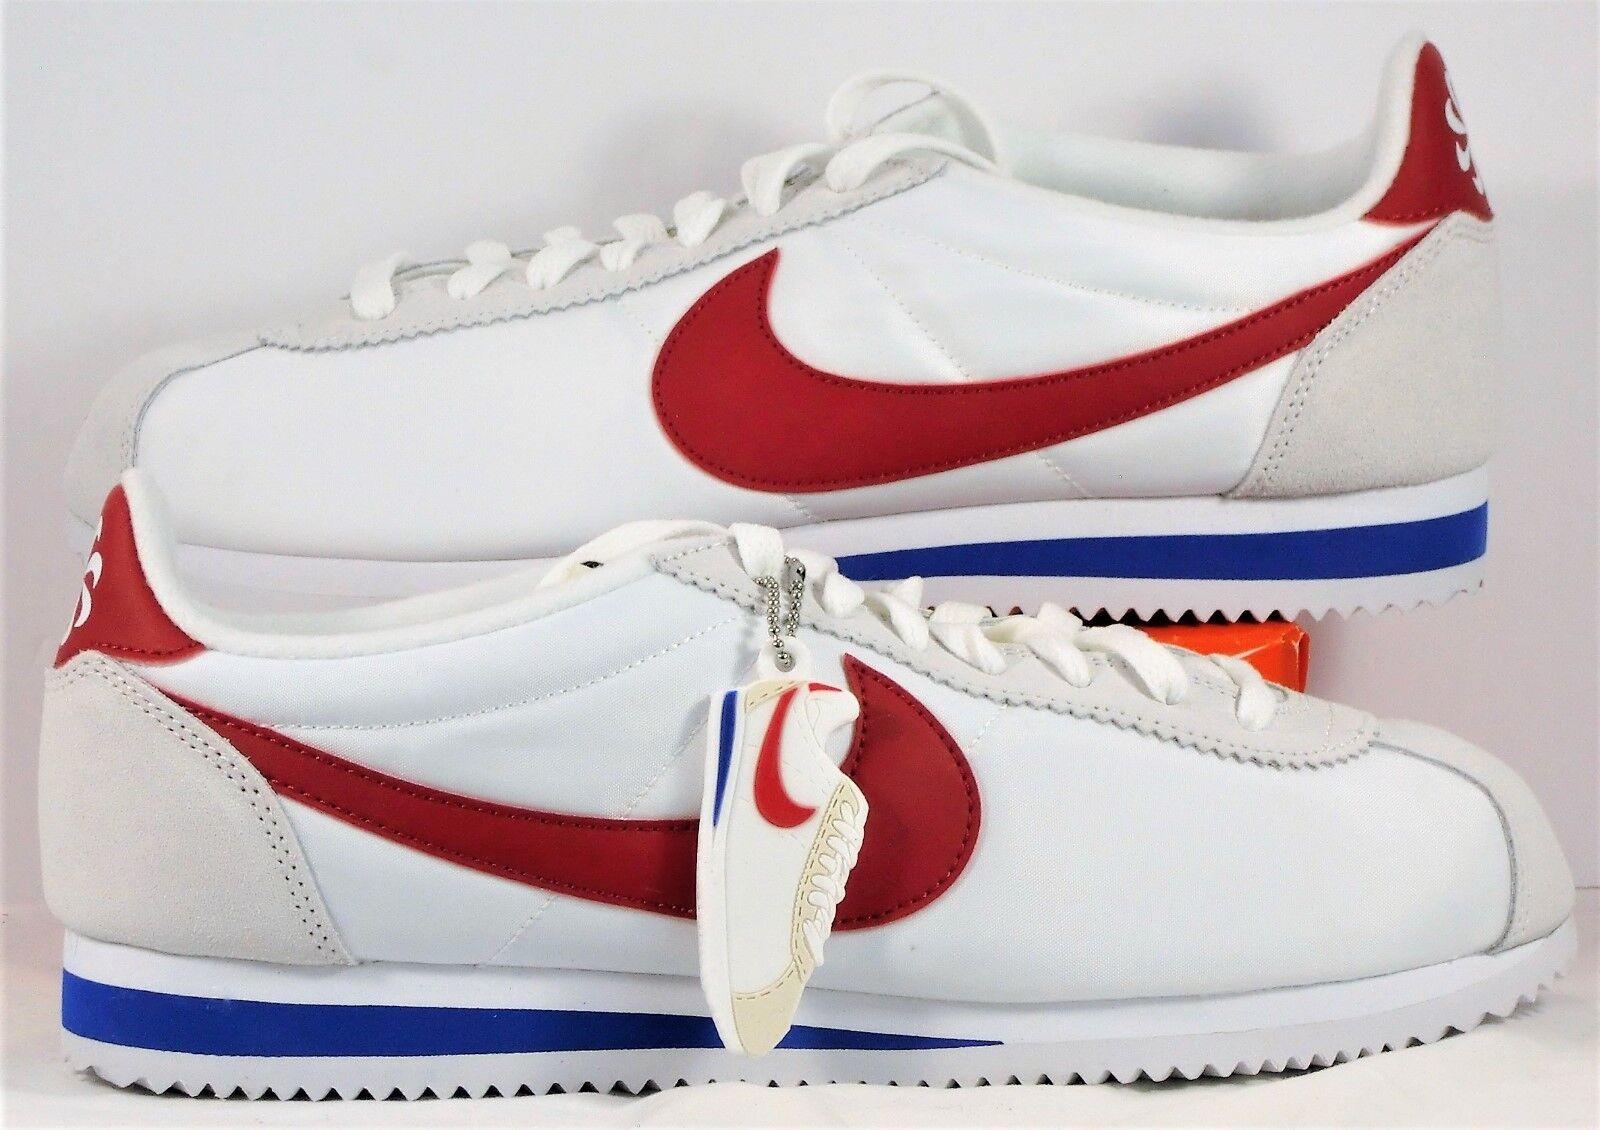 Nike cortez - - cortez klassiker - forrest gump, und rote & royal sz 9,5 neue 847709 164 44f8f3